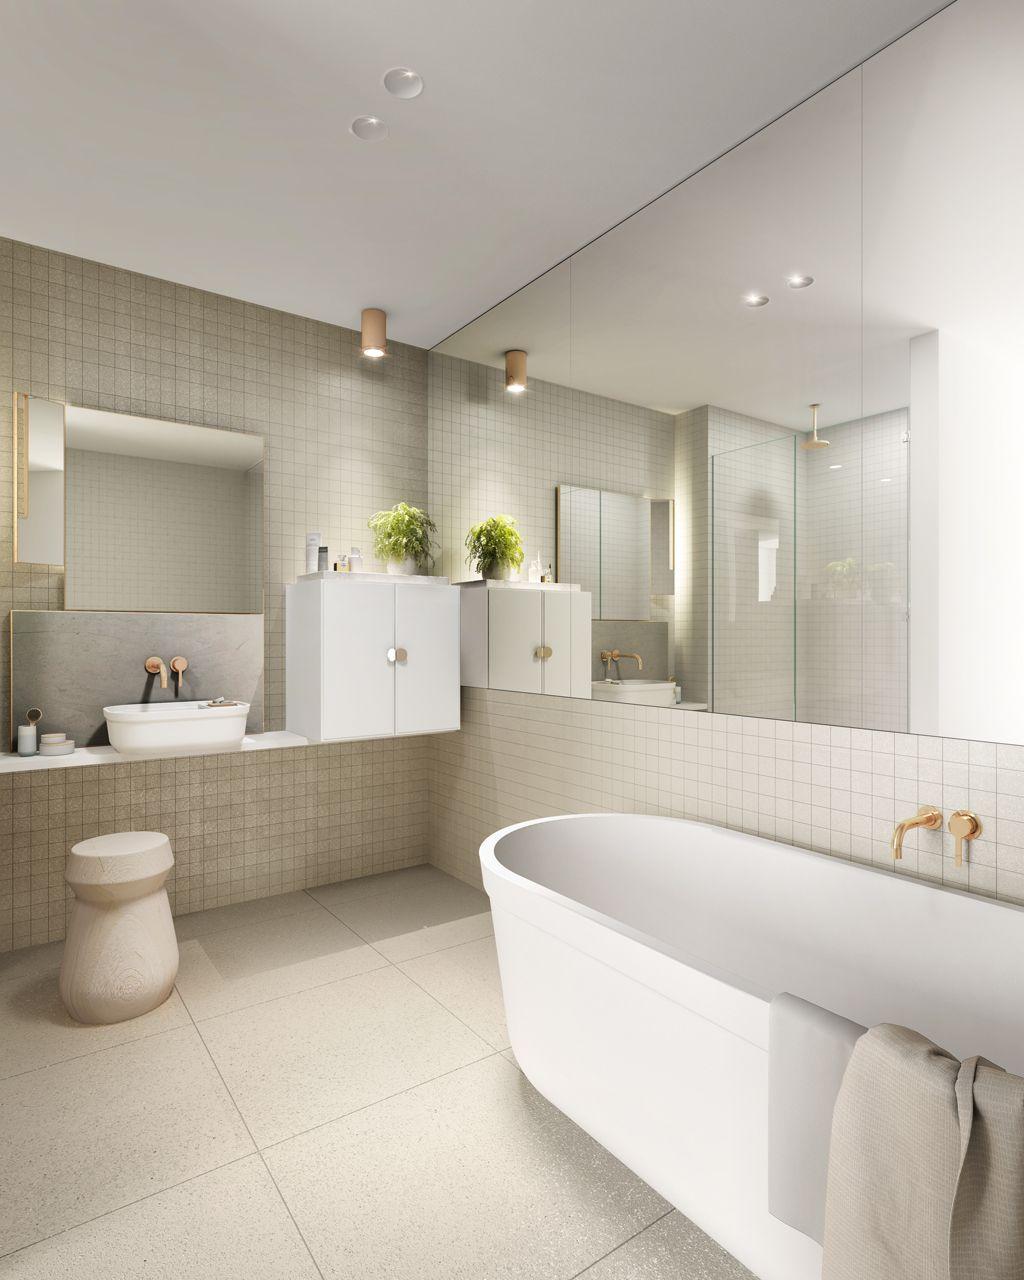 hecker guthrie bathroom - Google Search | Design & Decor | Pinterest ...